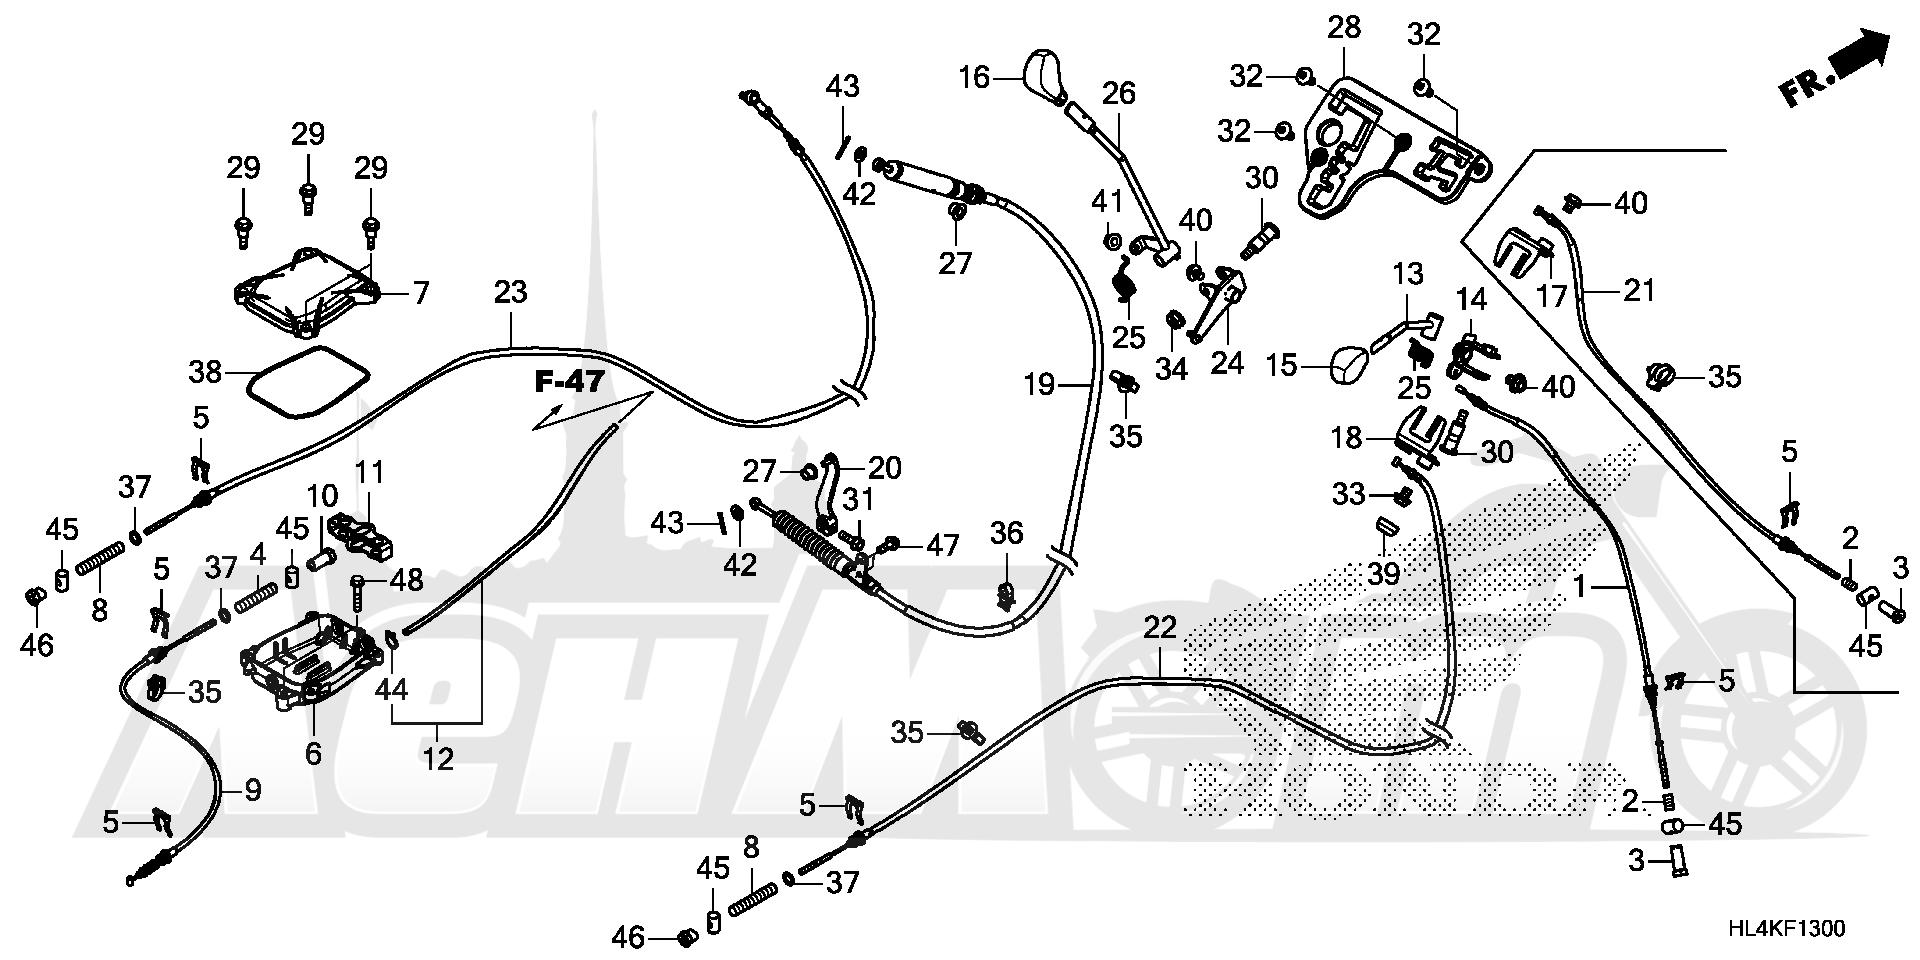 Запчасти для Квадроцикла Honda 2019 SXS1000M3P Раздел: SHIFT LEVER AND SELECT LEVER | лапка переключения и SELECT рычаг